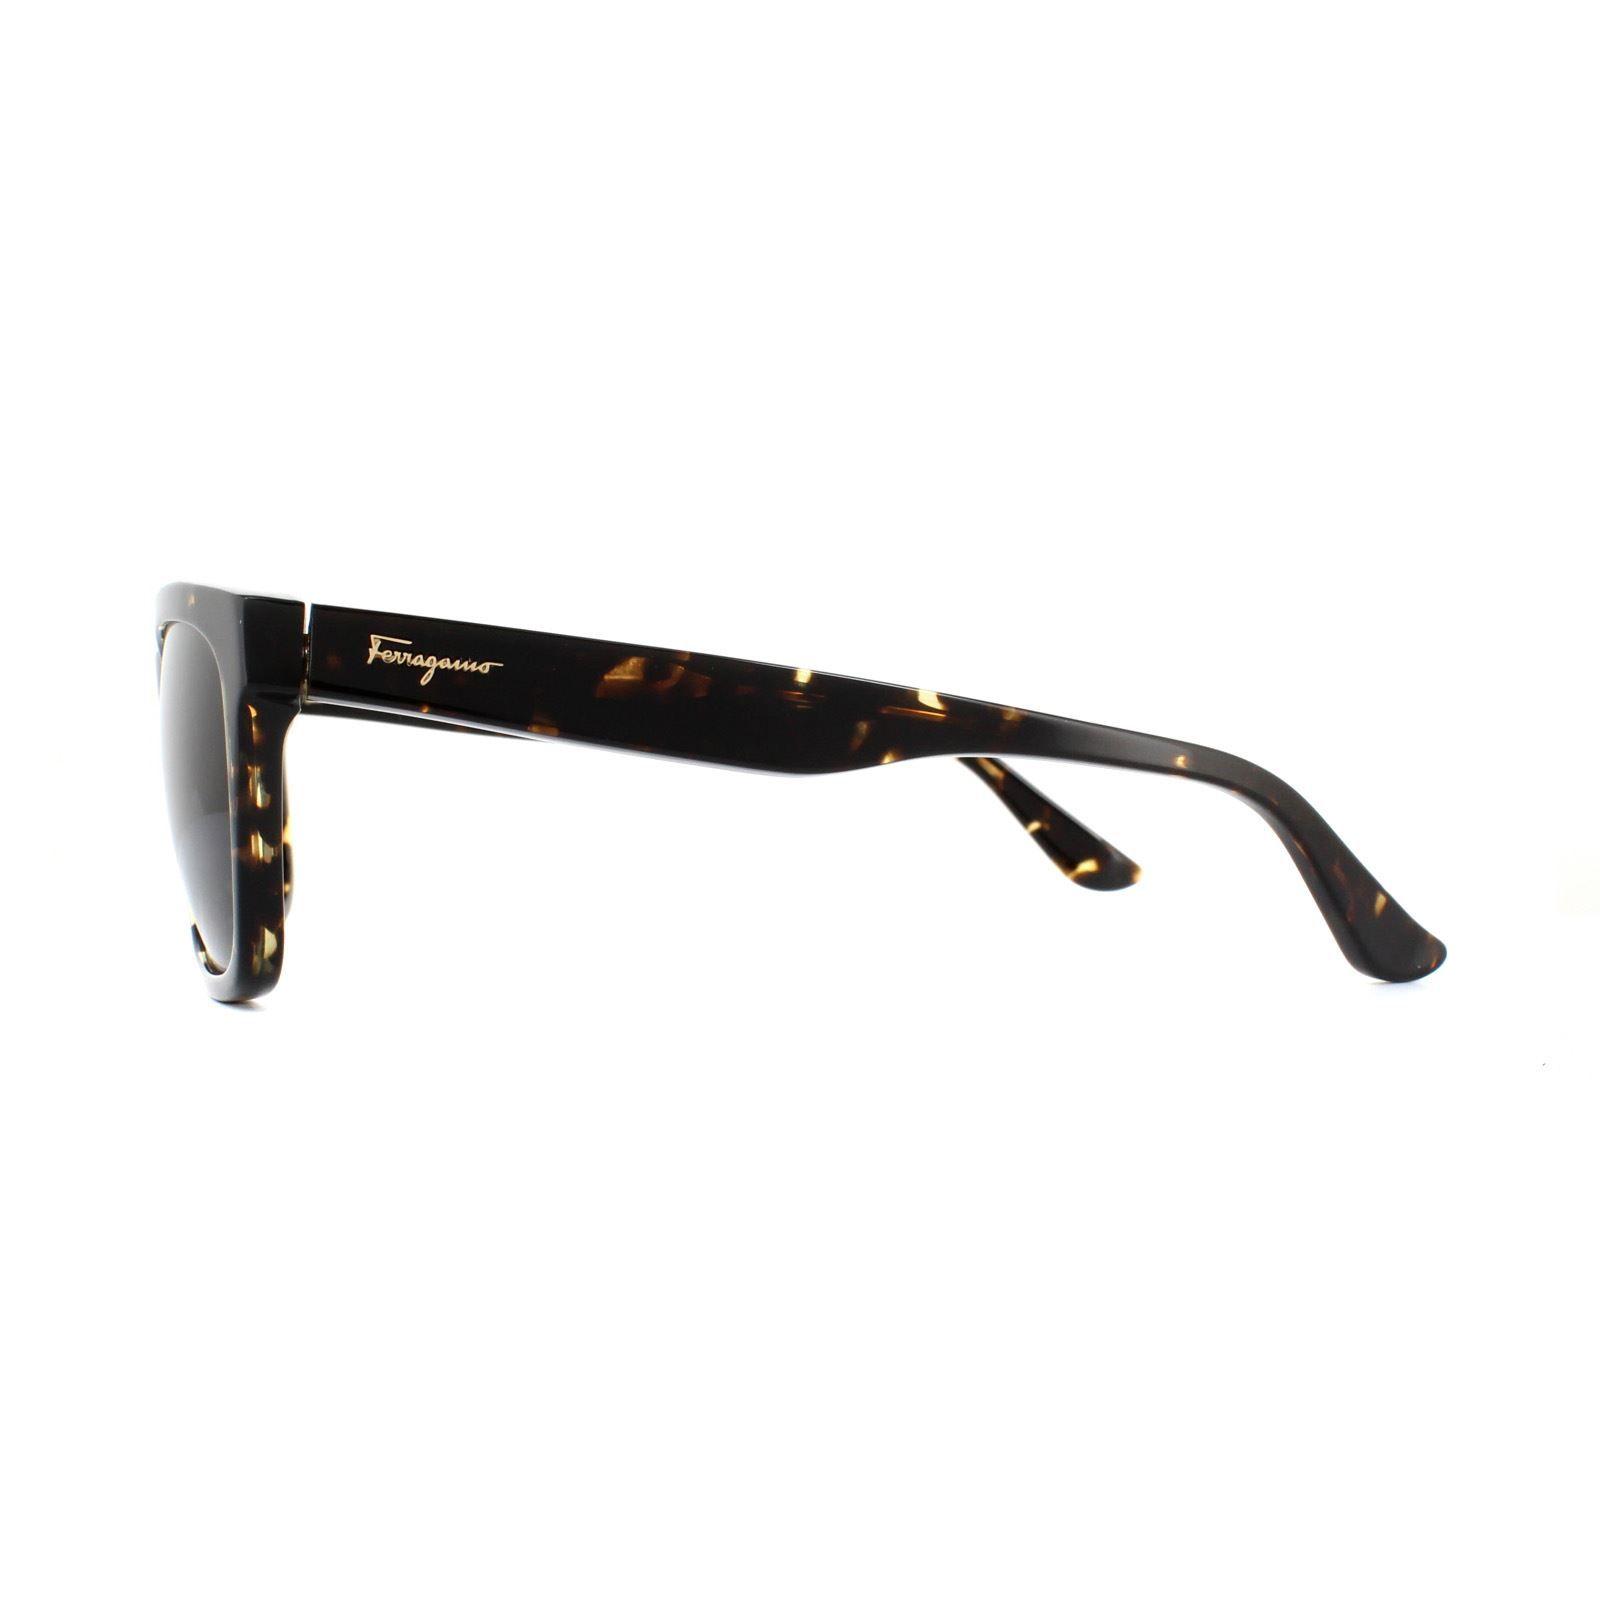 Salvatore Ferragamo Sunglasses SF775S 281 Vintage Tortoise Green